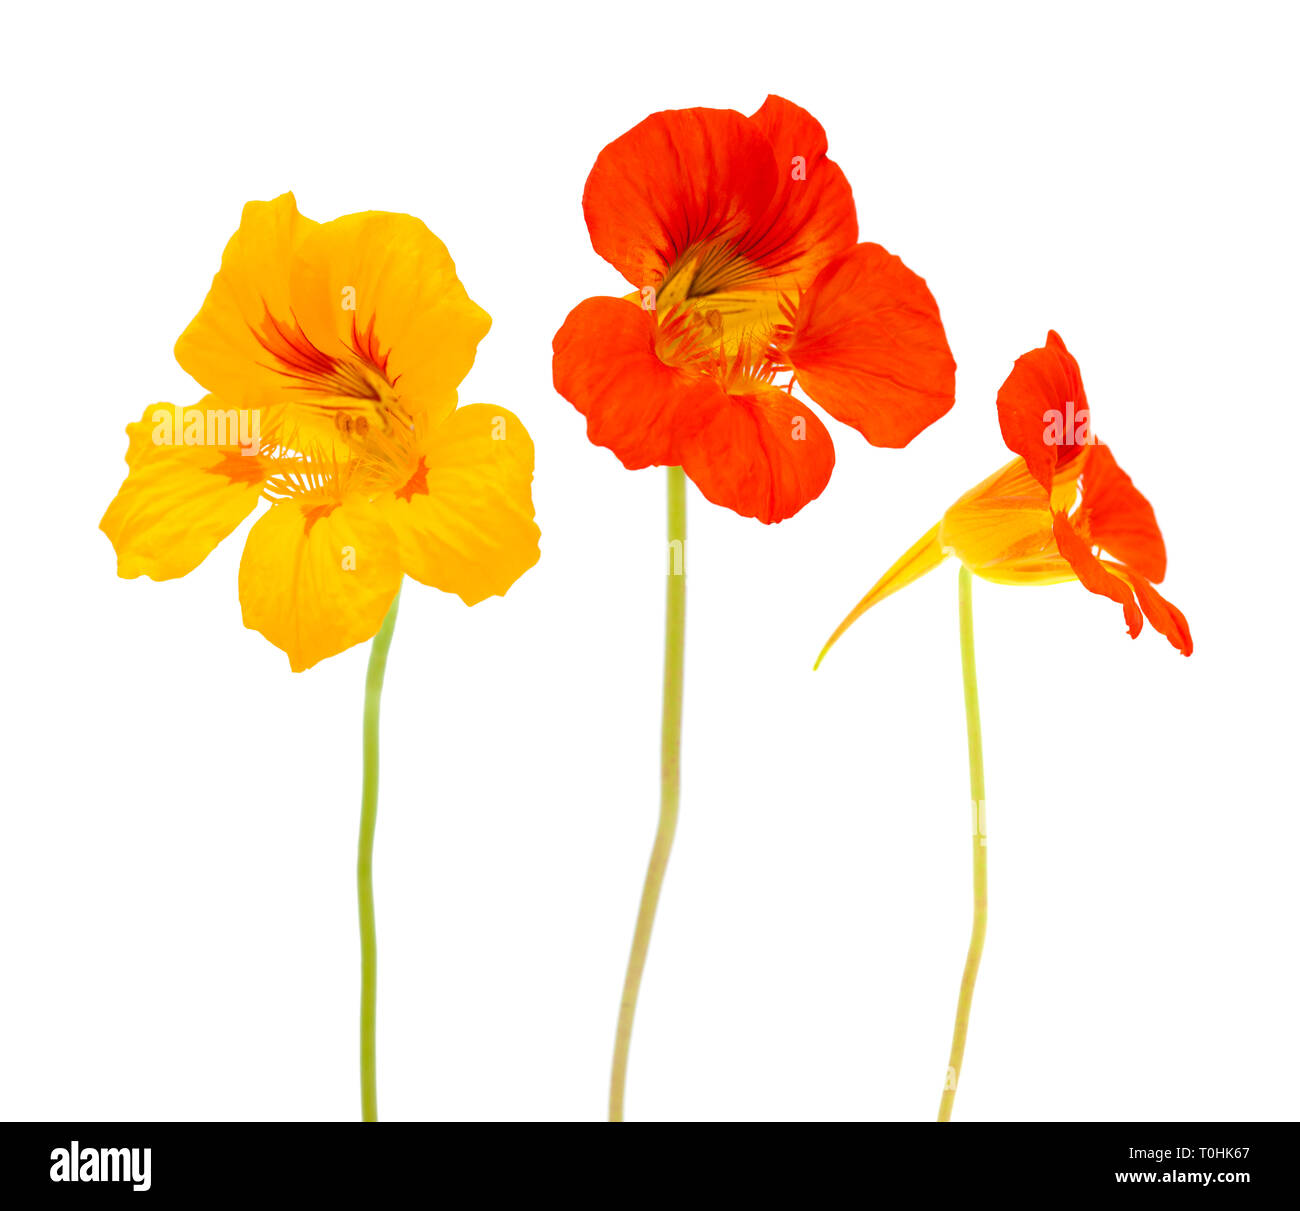 Flora of Gran Canaria - Tropaeolum majus, garden nasturtium isolated on white background Stock Photo